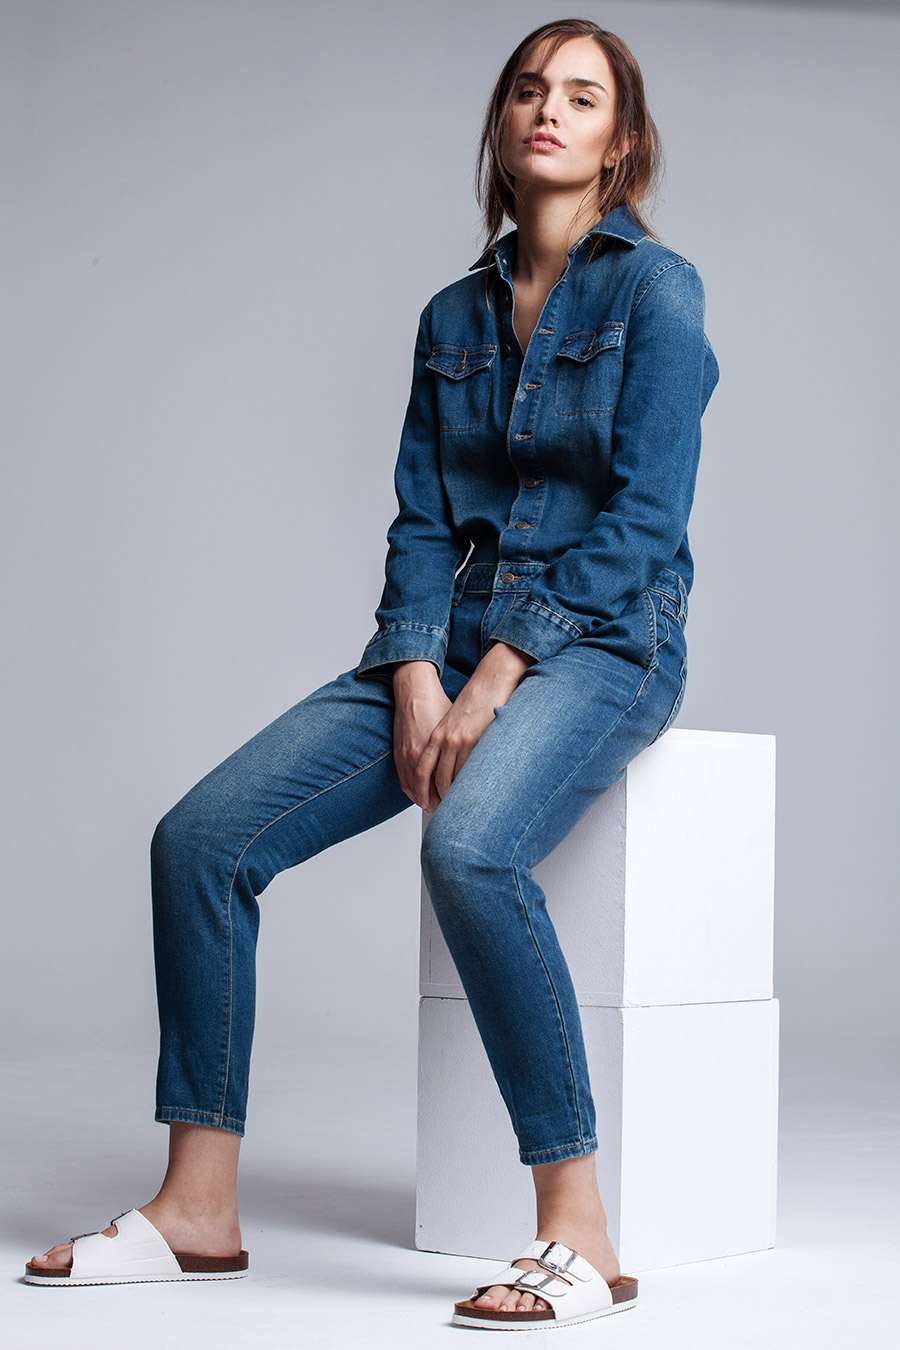 fashion-editorial-julio-paniagua-02